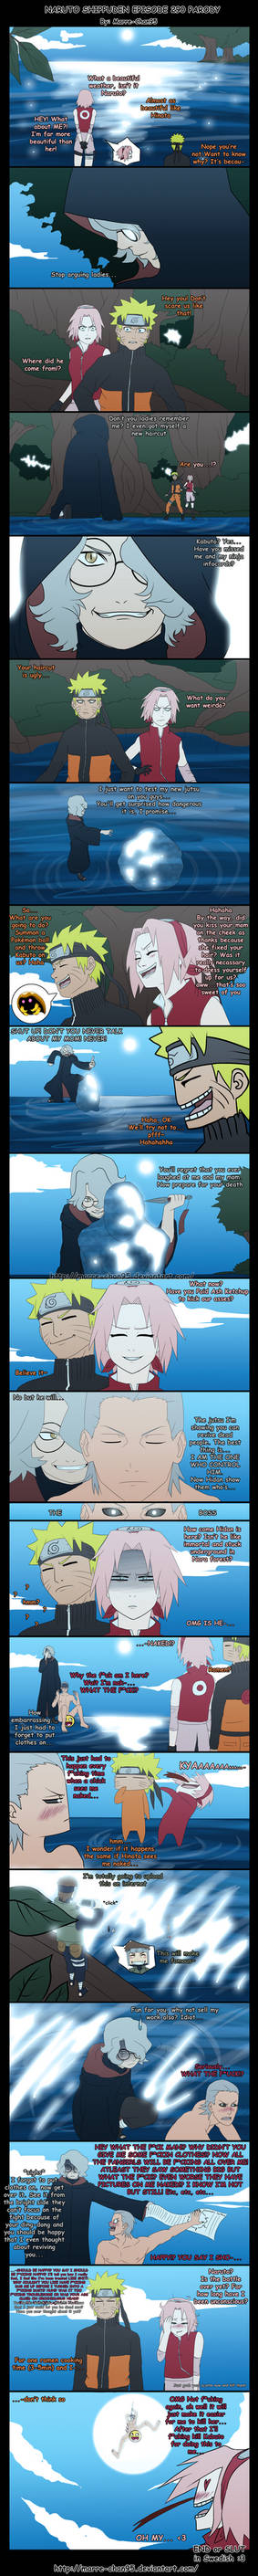 --+Naruto Shippuden Episode 290 Parody+--